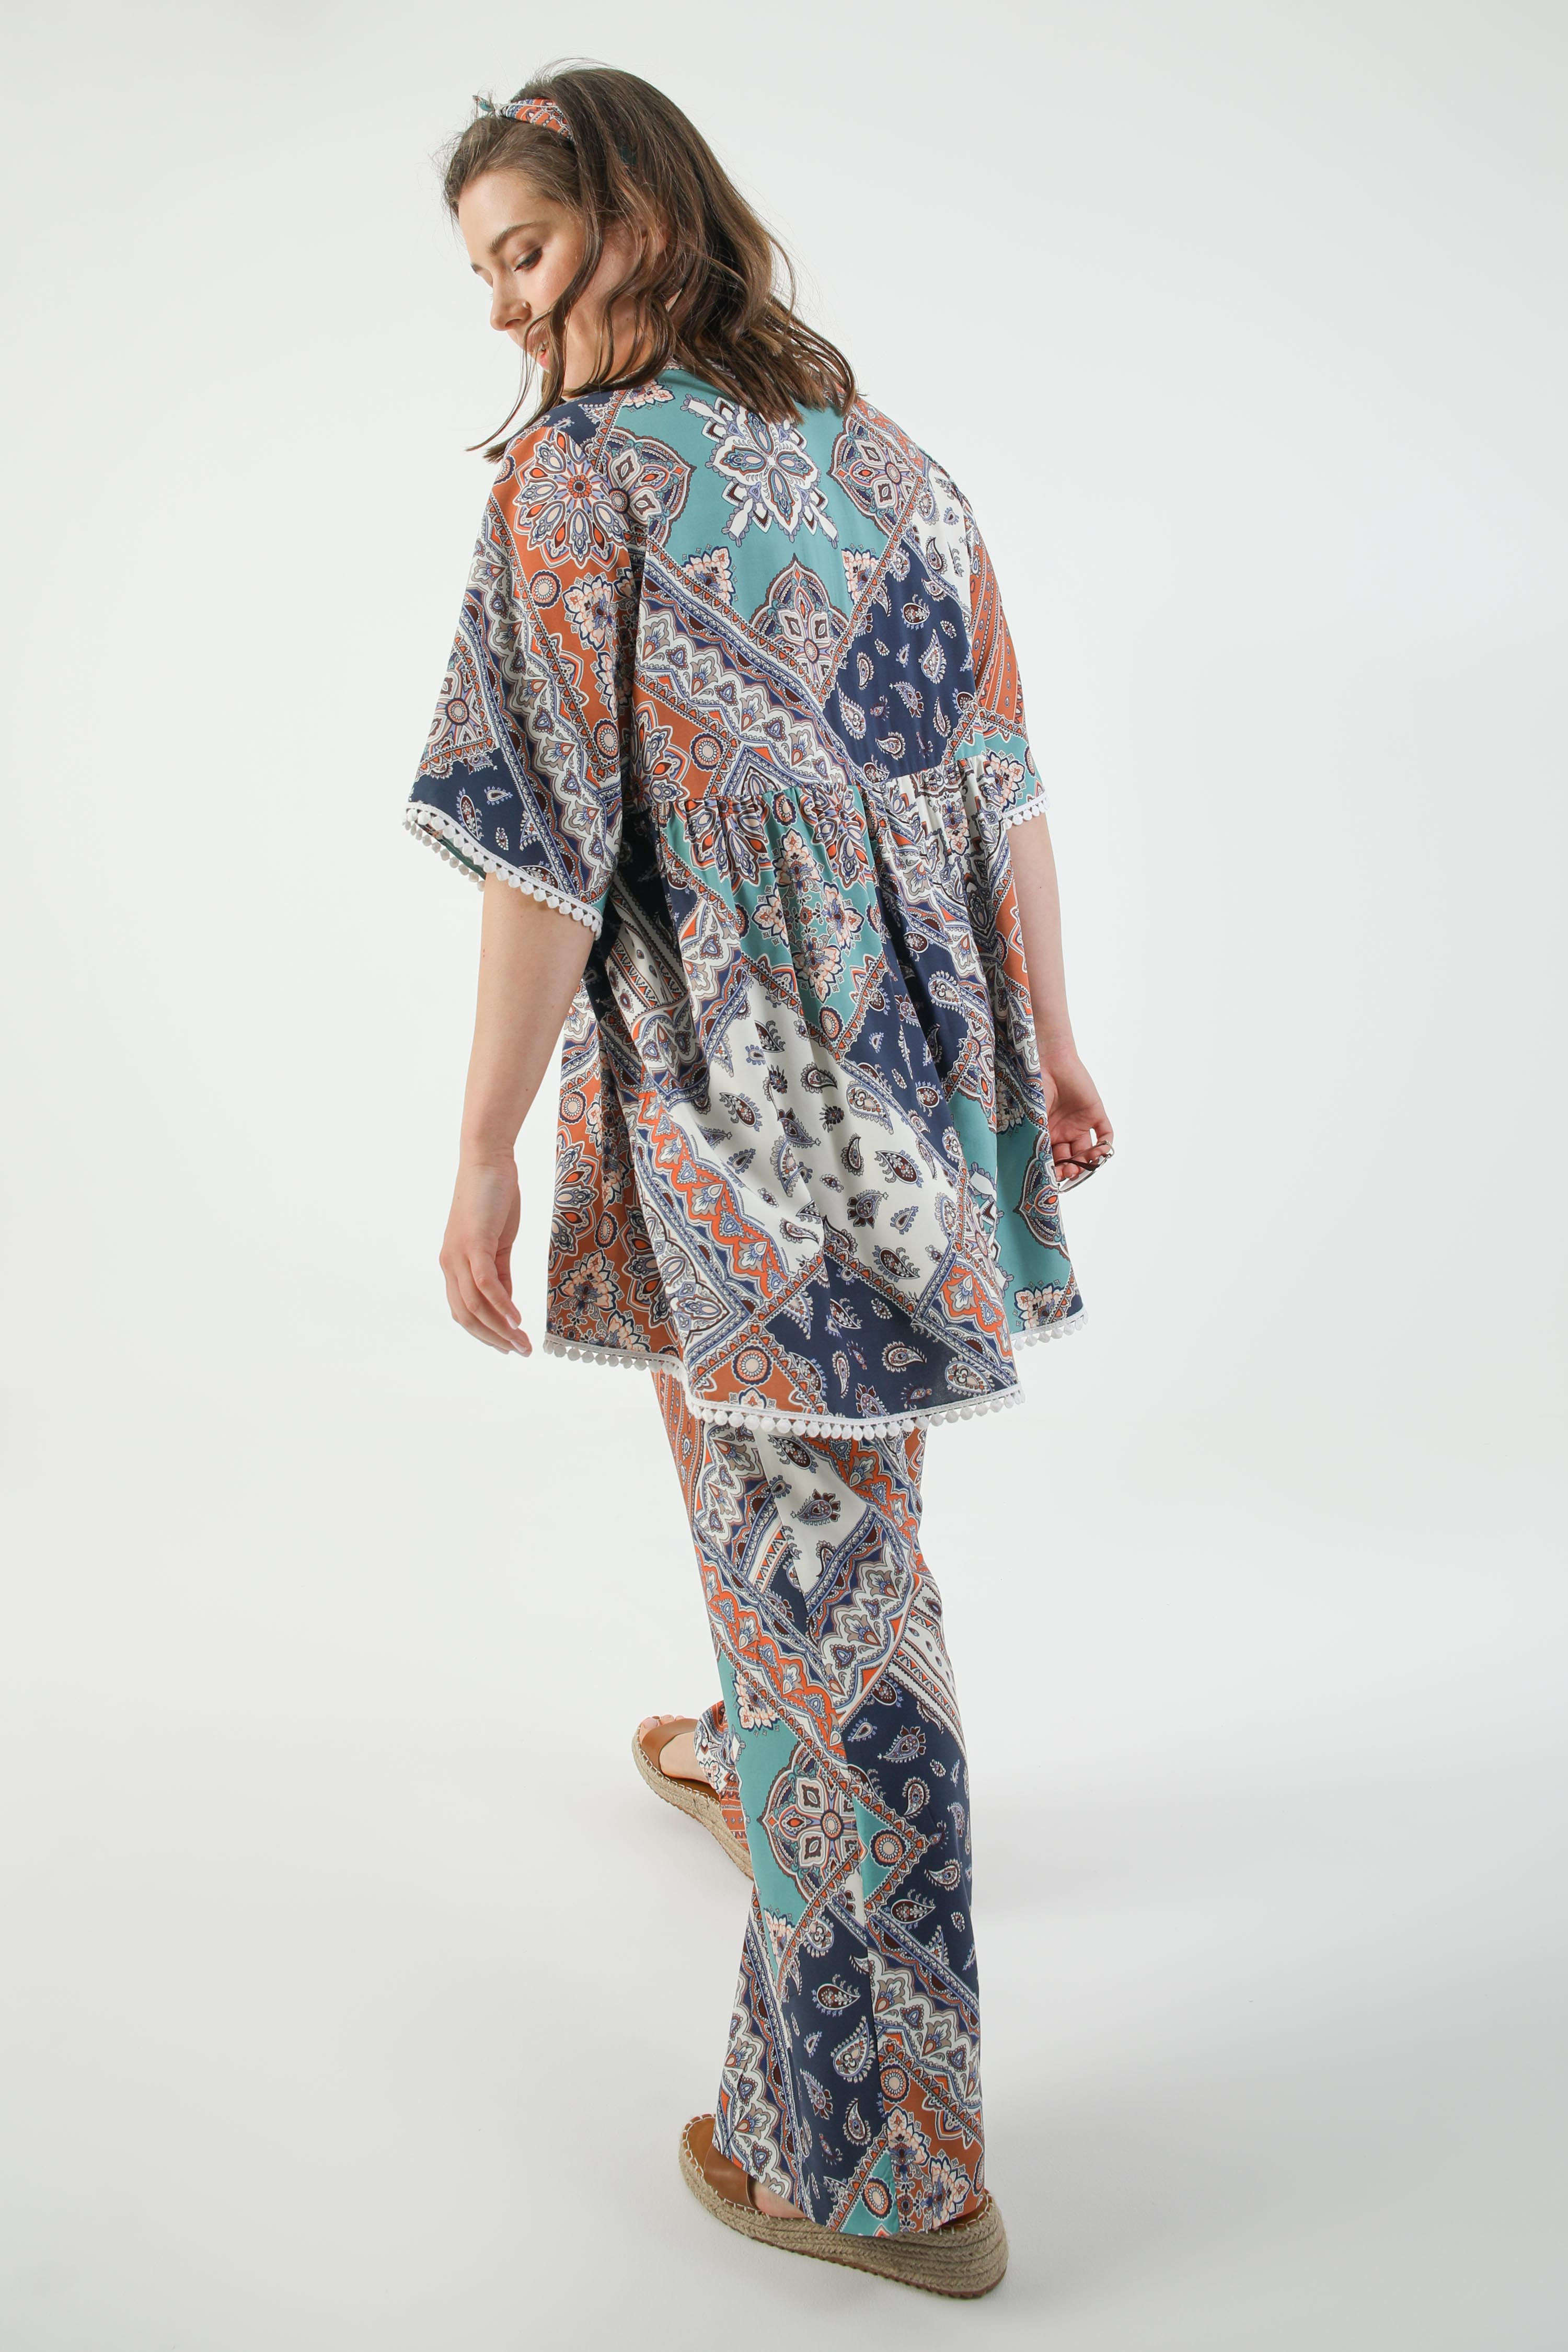 bohemian style printed tunic (shipping 15/20 May)